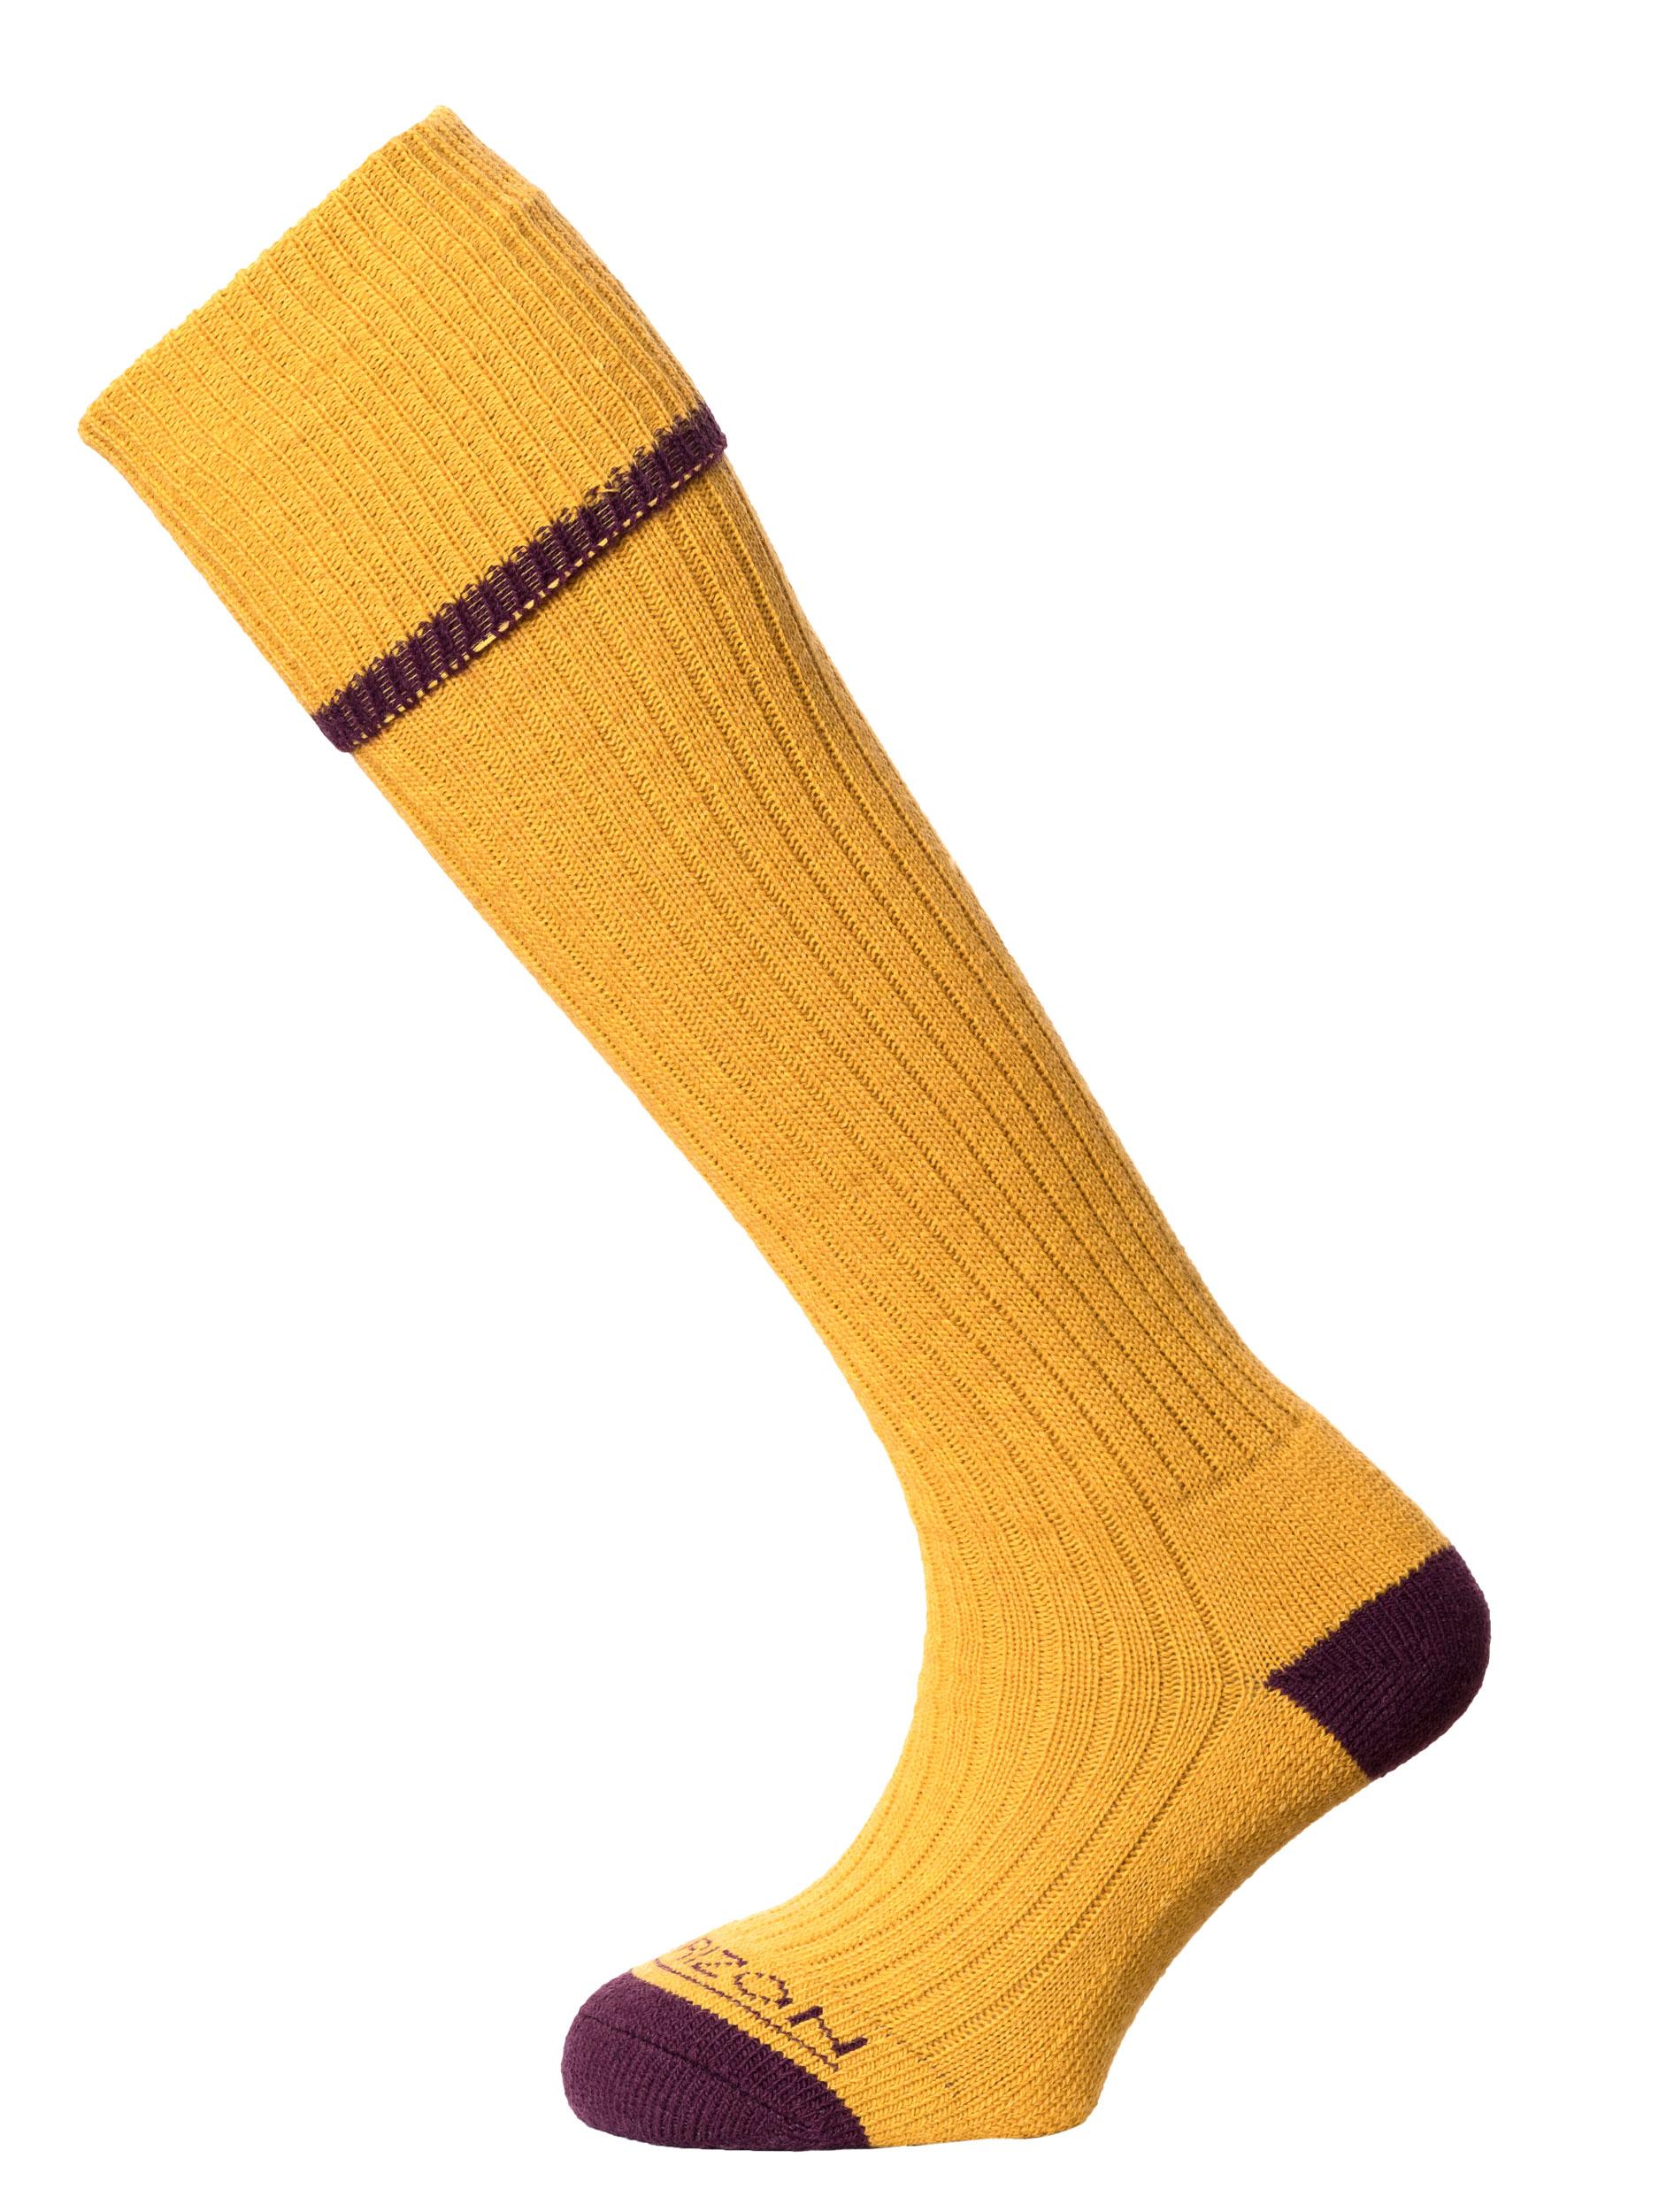 Horizon Field Sport Turn-over-Top Sock Mustard Burgundy